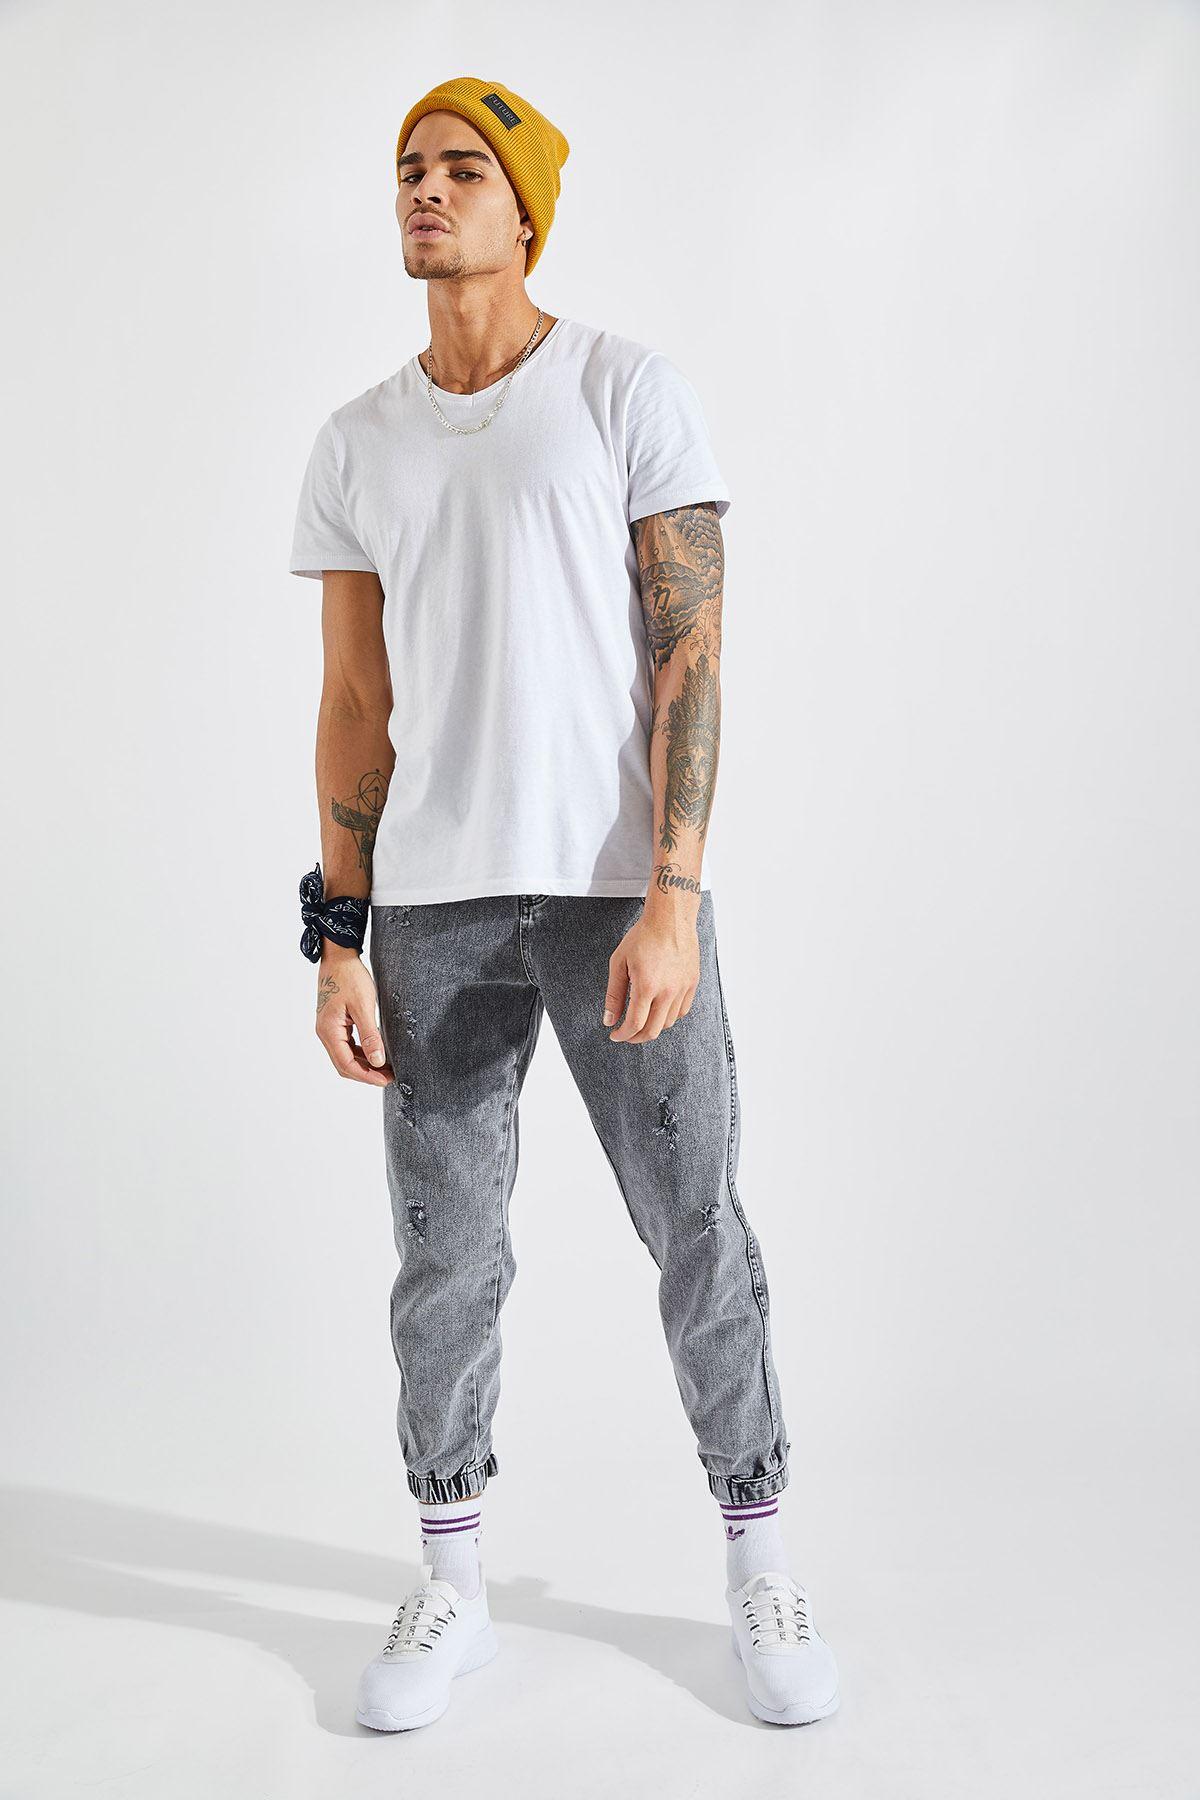 Erkek Paça Lastikli Lazer Tırnaklı Gri Kot Pantolon